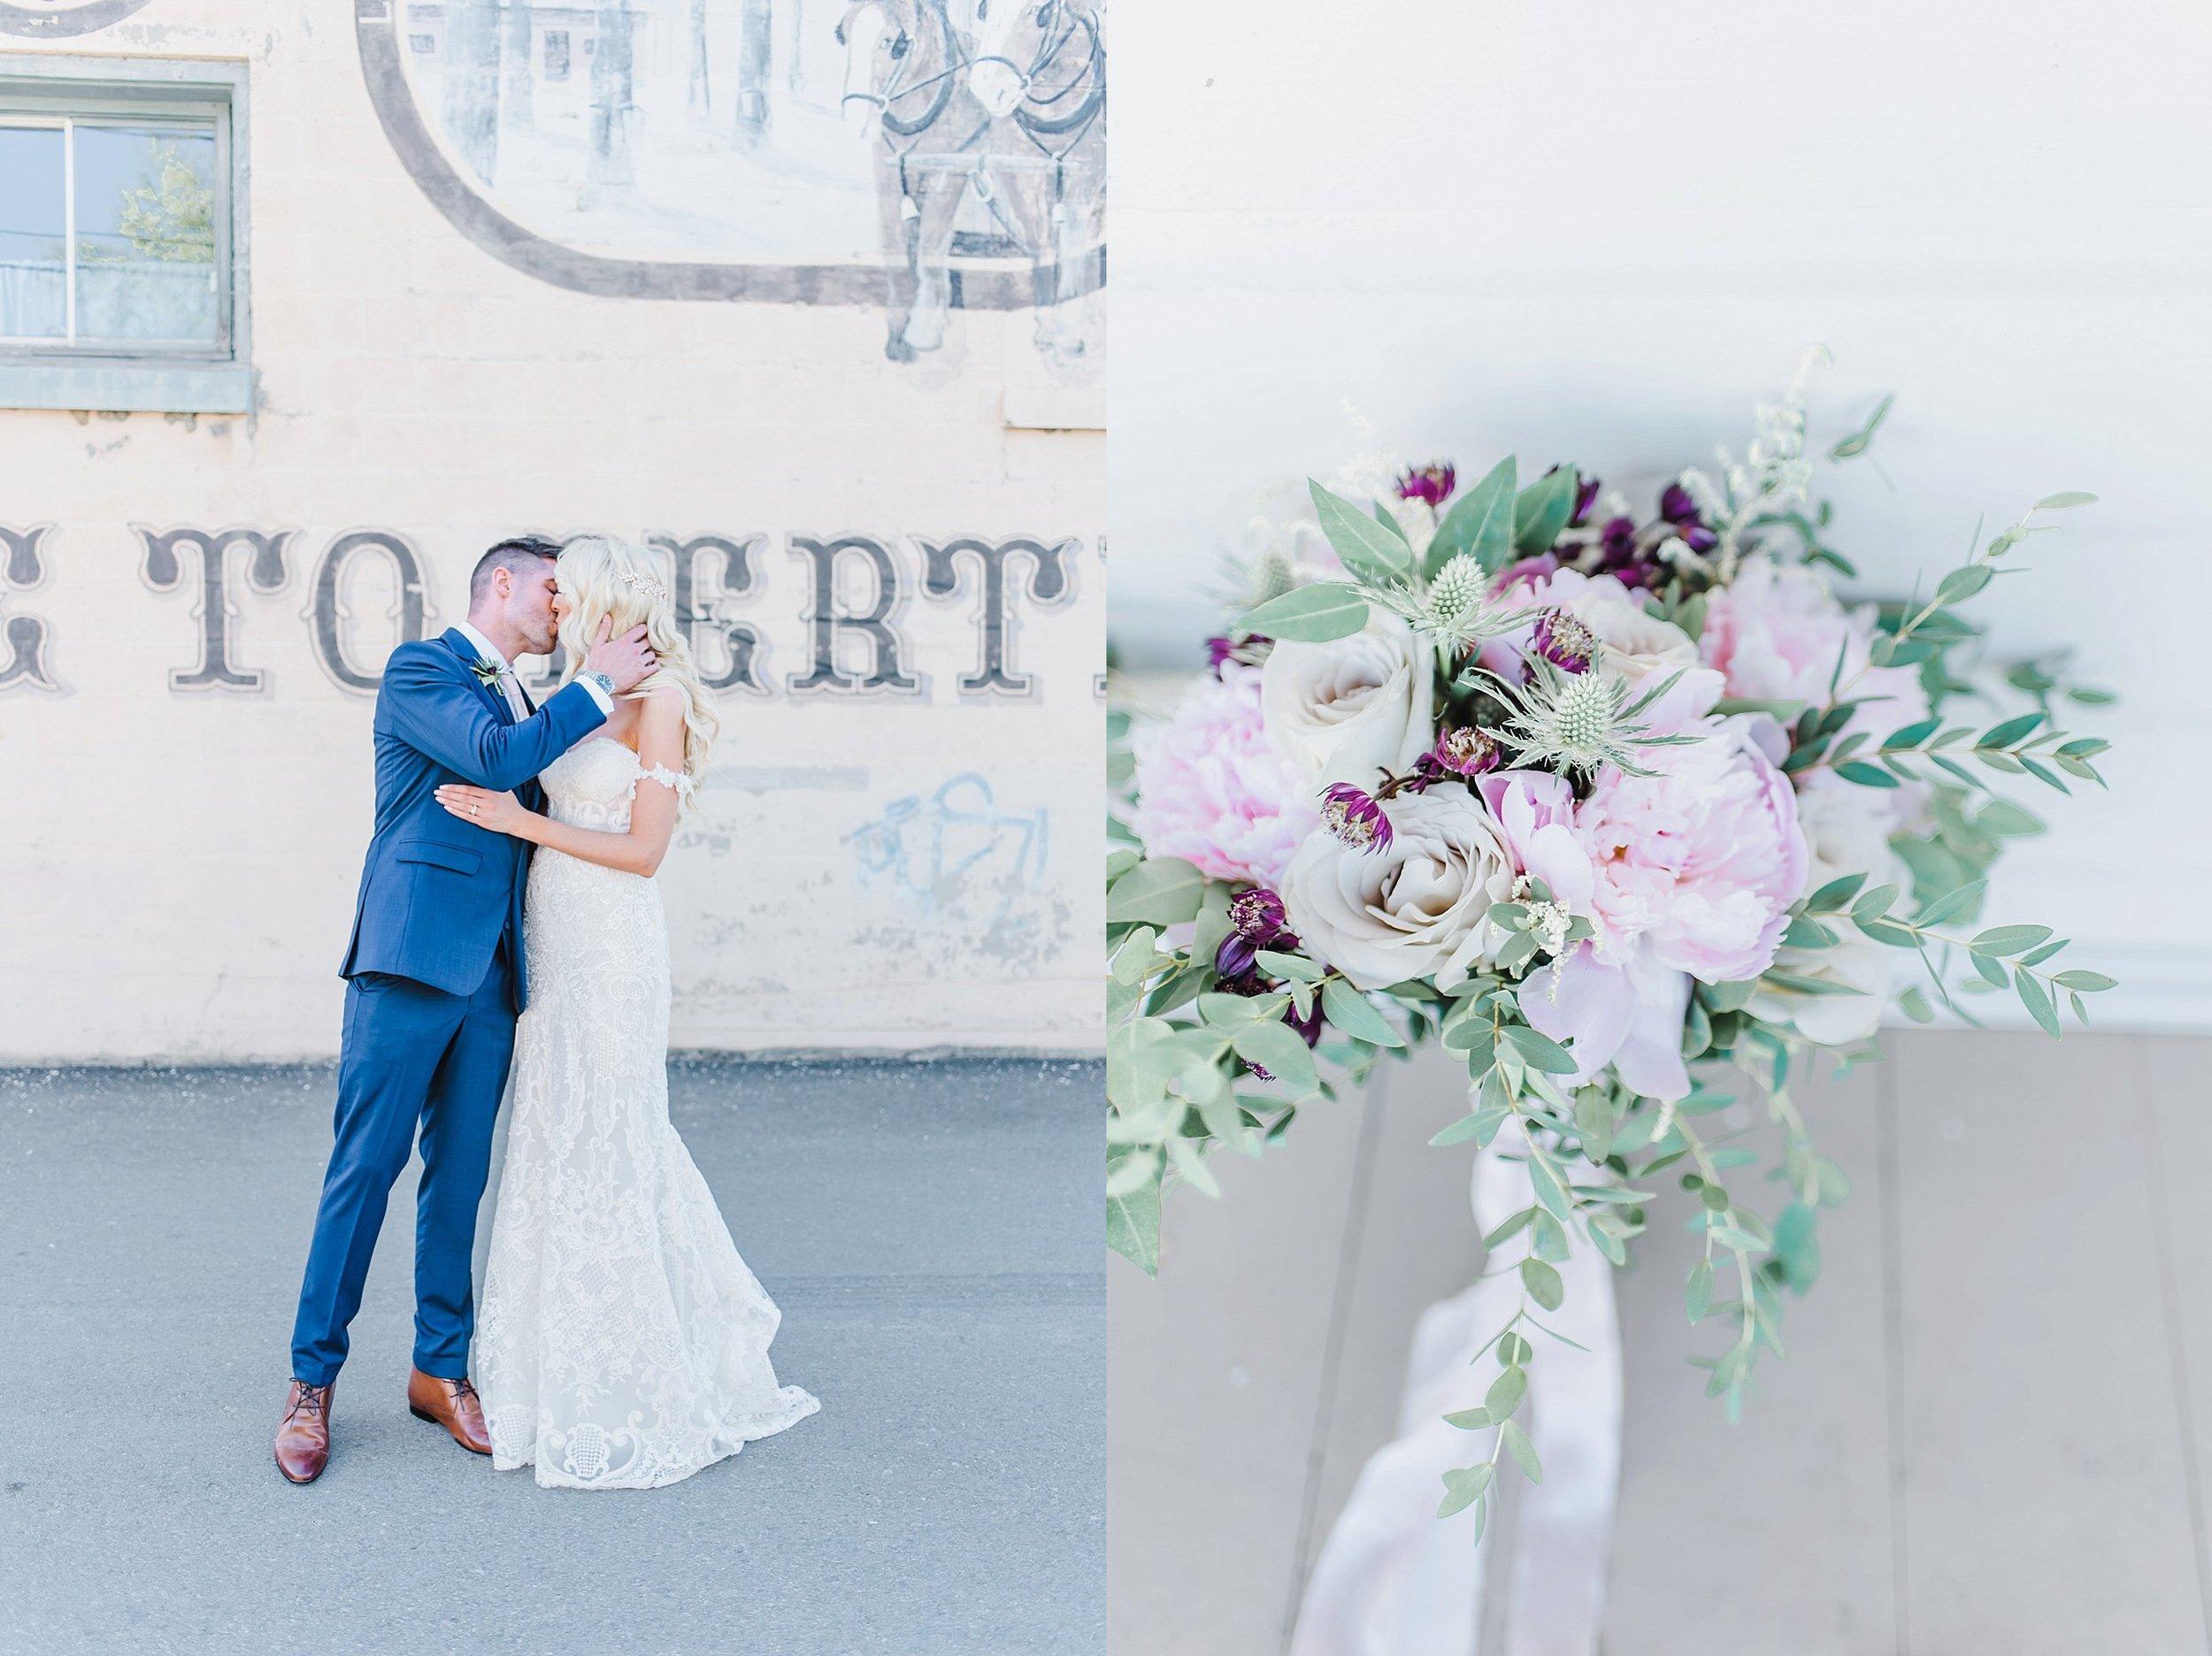 light airy indie fine art ottawa wedding photographer | Ali and Batoul Photography_0079.jpg